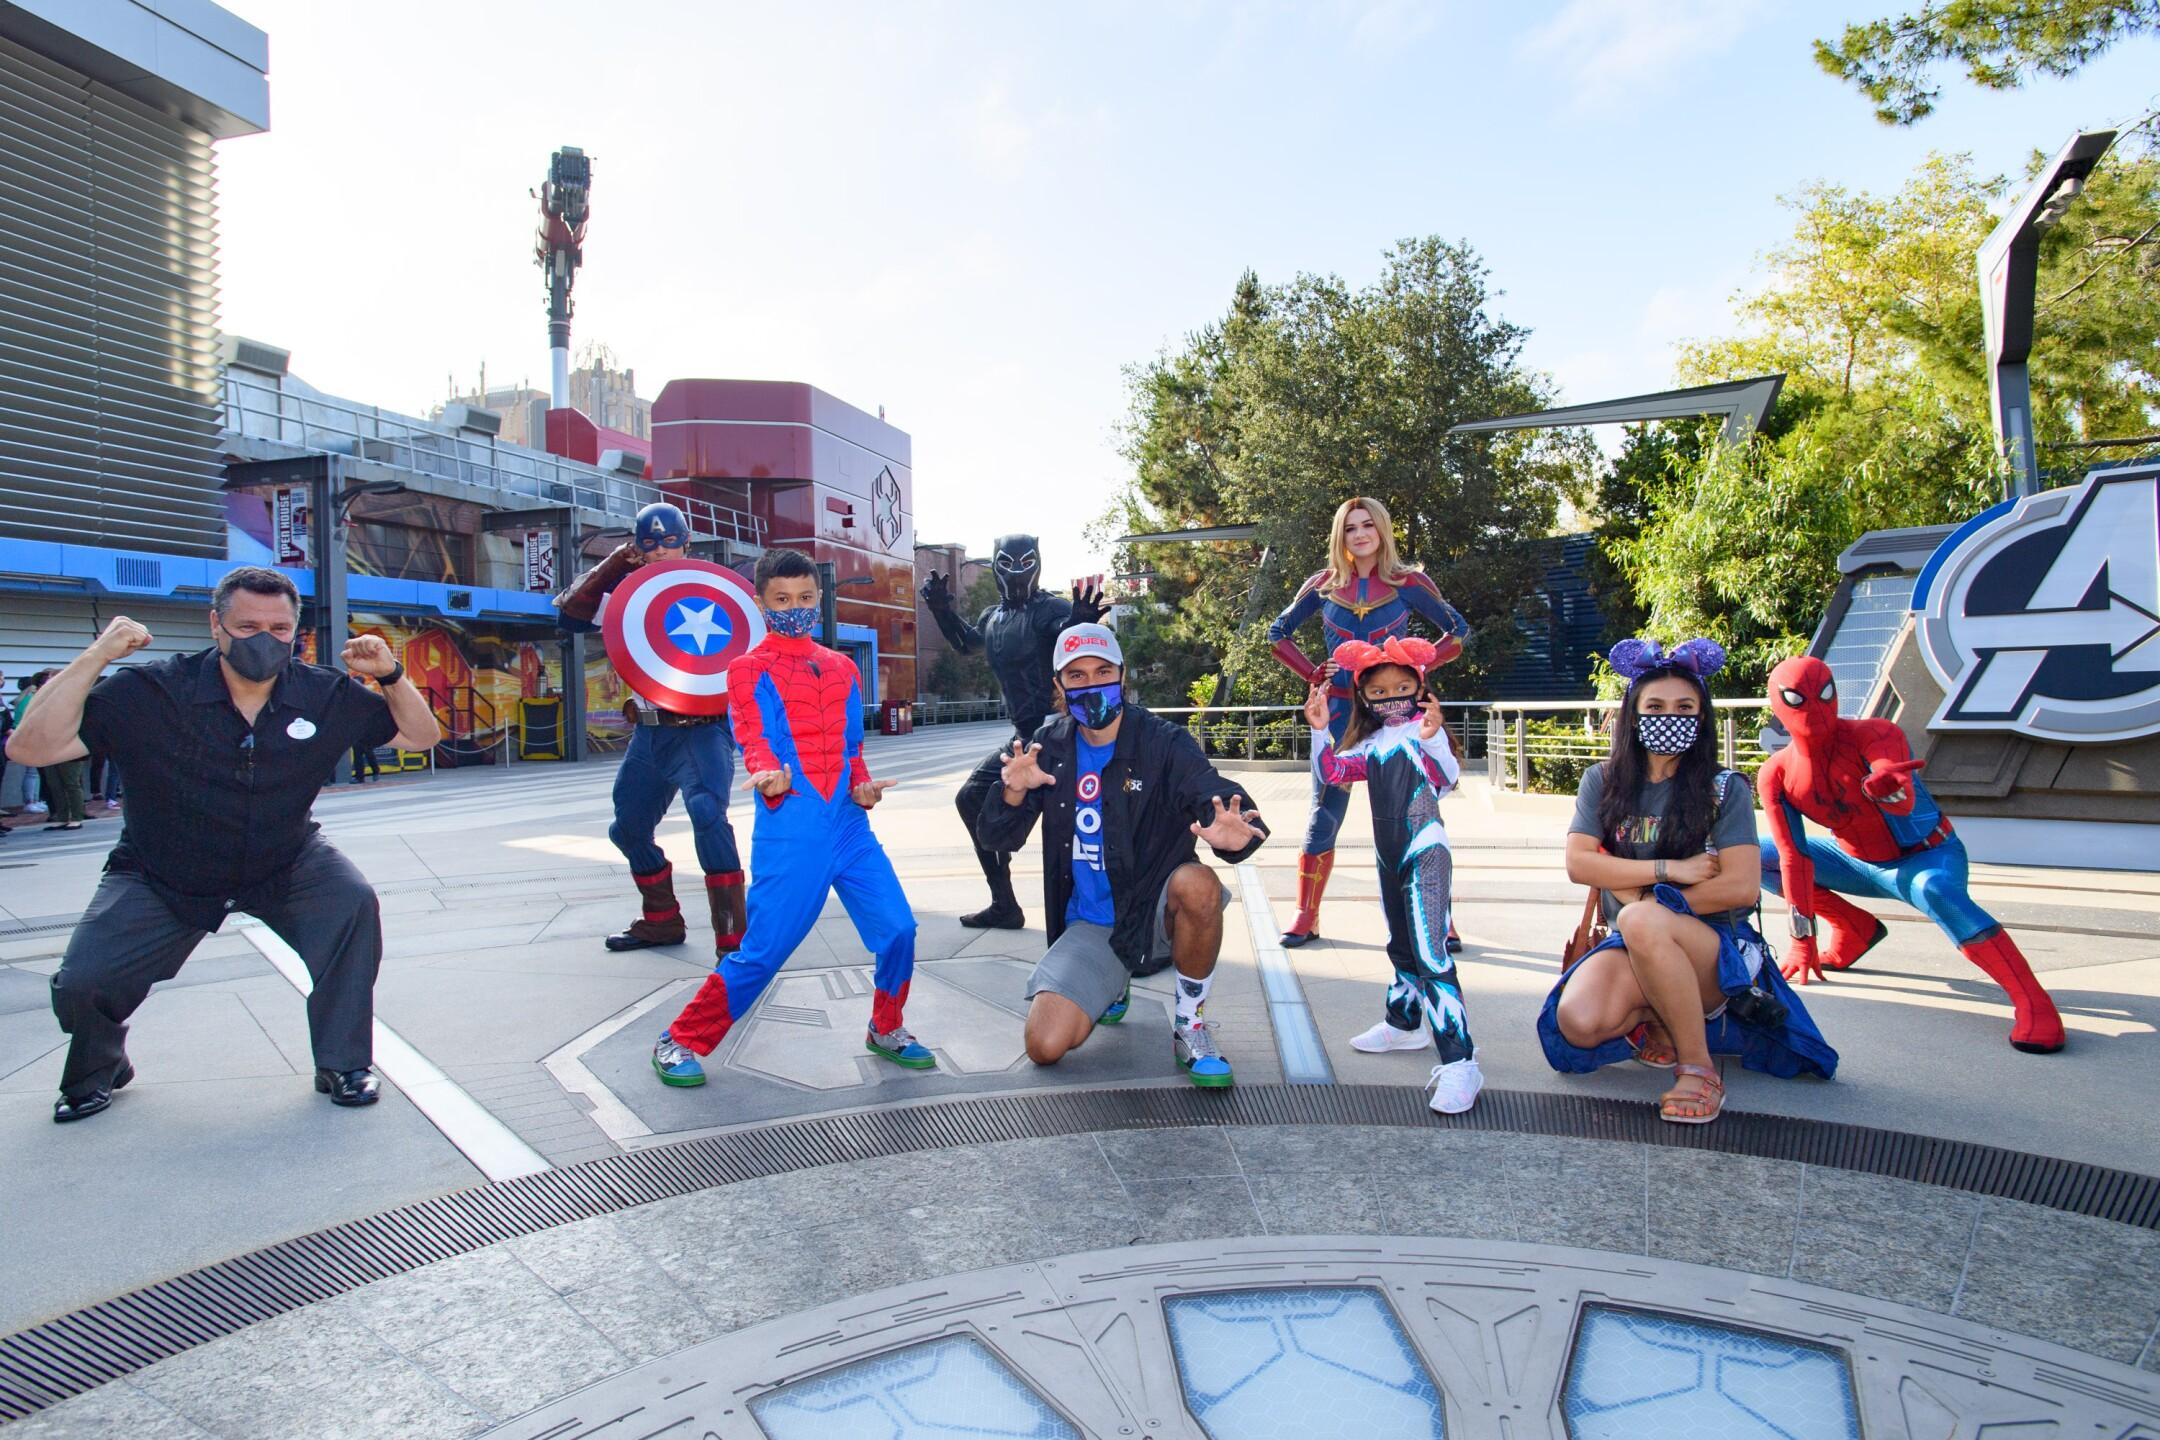 Ken Potrock, President of Disneyland Resort, Welcomes First Guests to Avengers Campus at Disney California Adventure Park